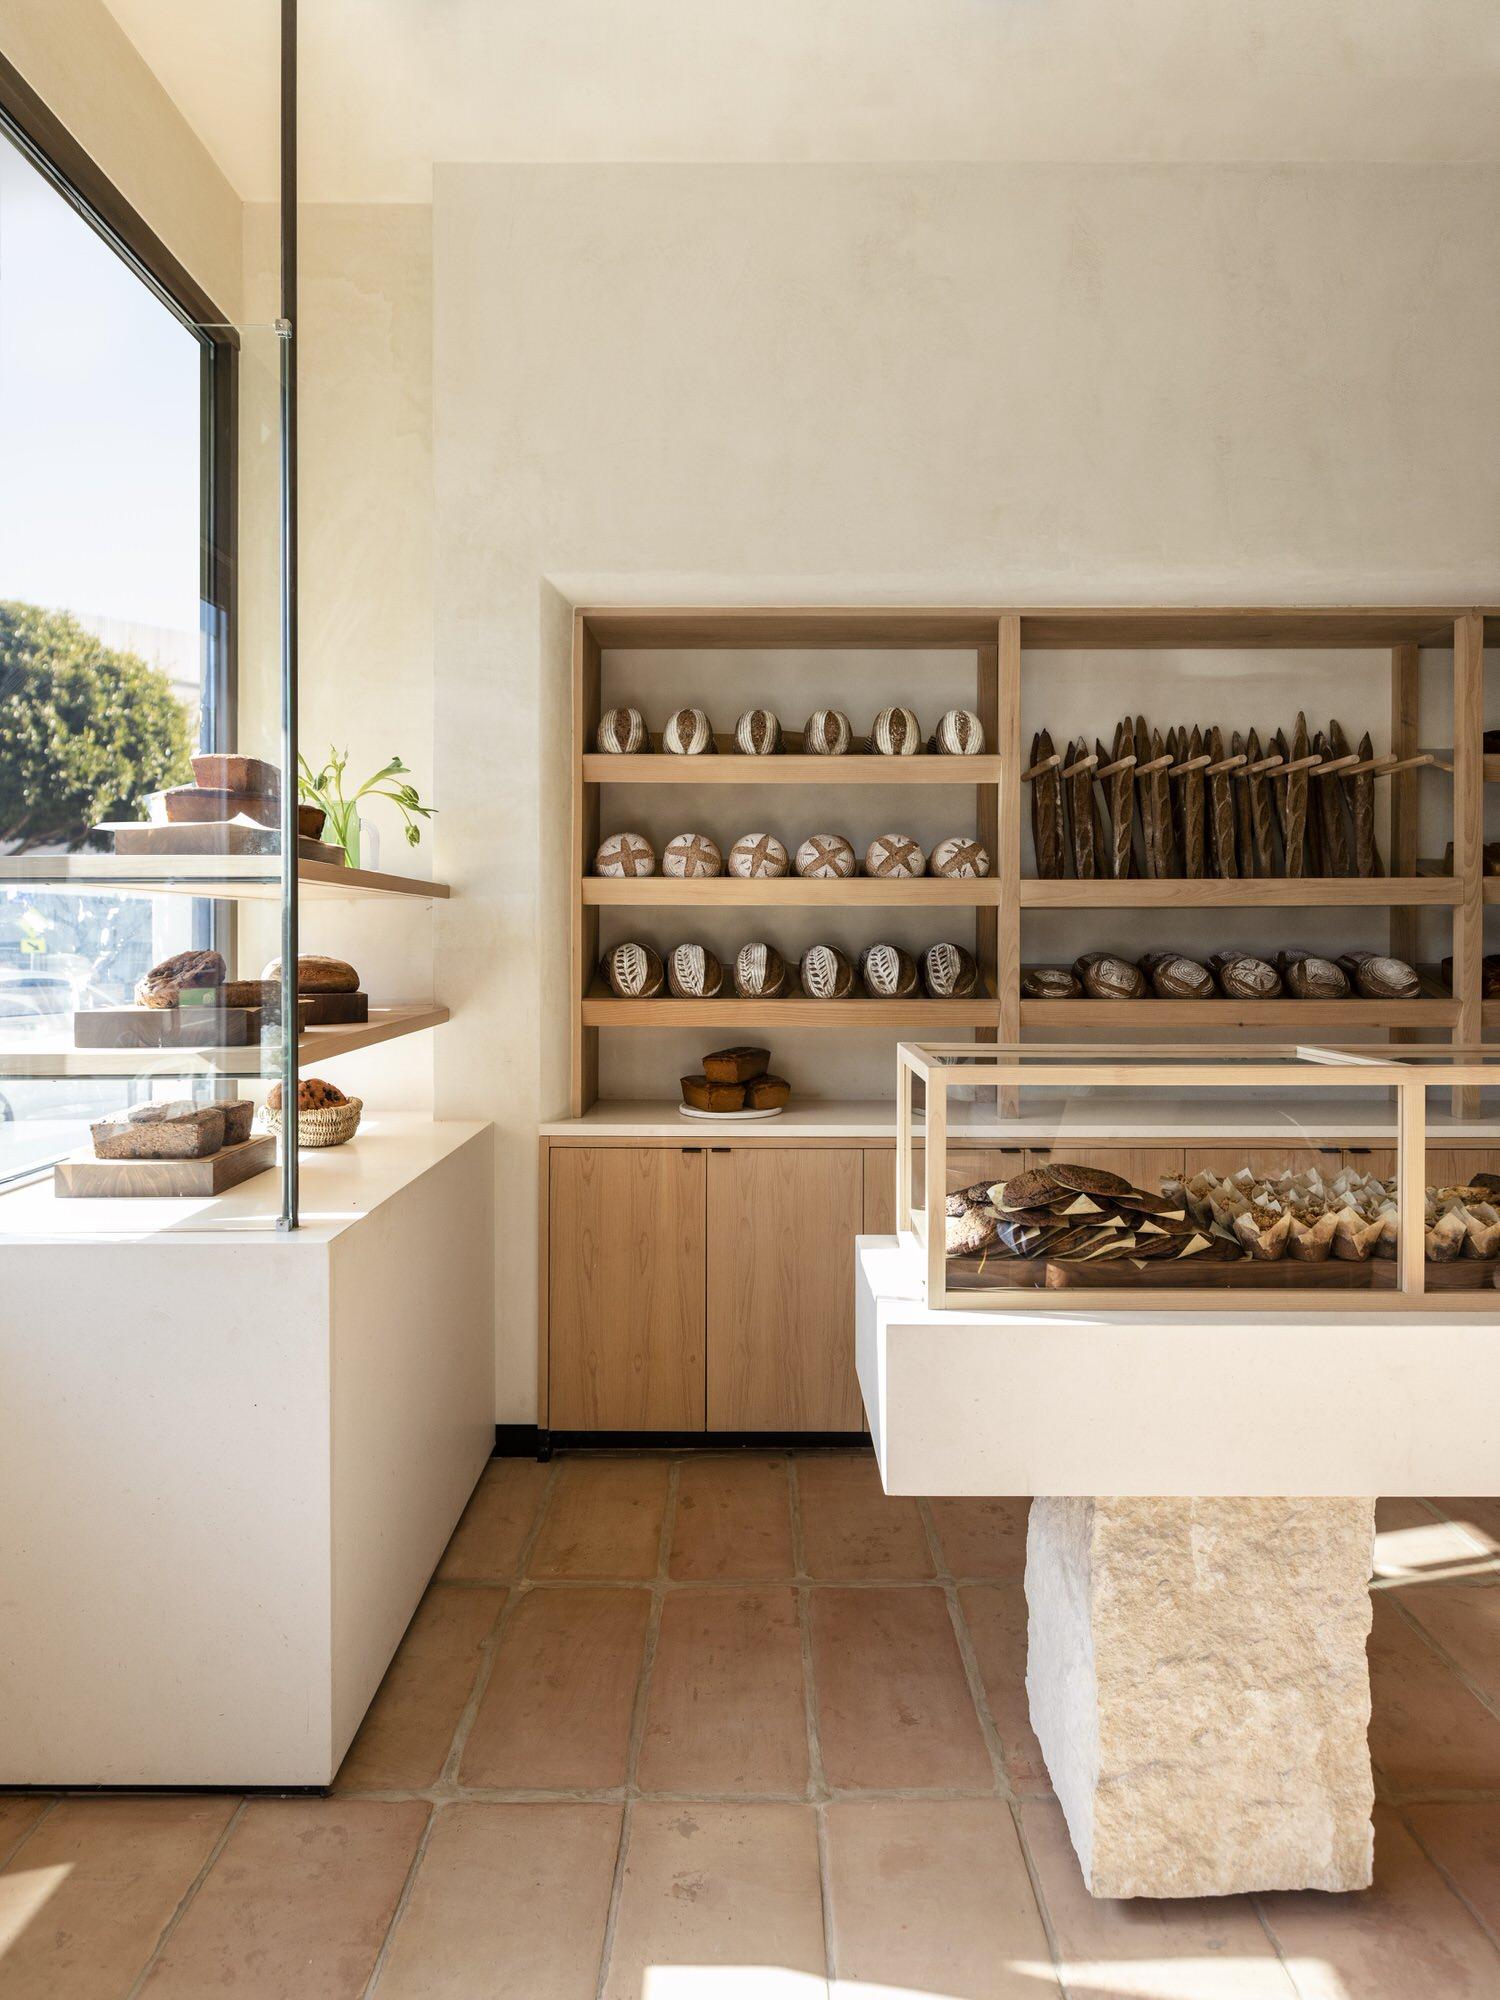 Breadblok Designed By Commune. Photographed By Laure Joliet 2020